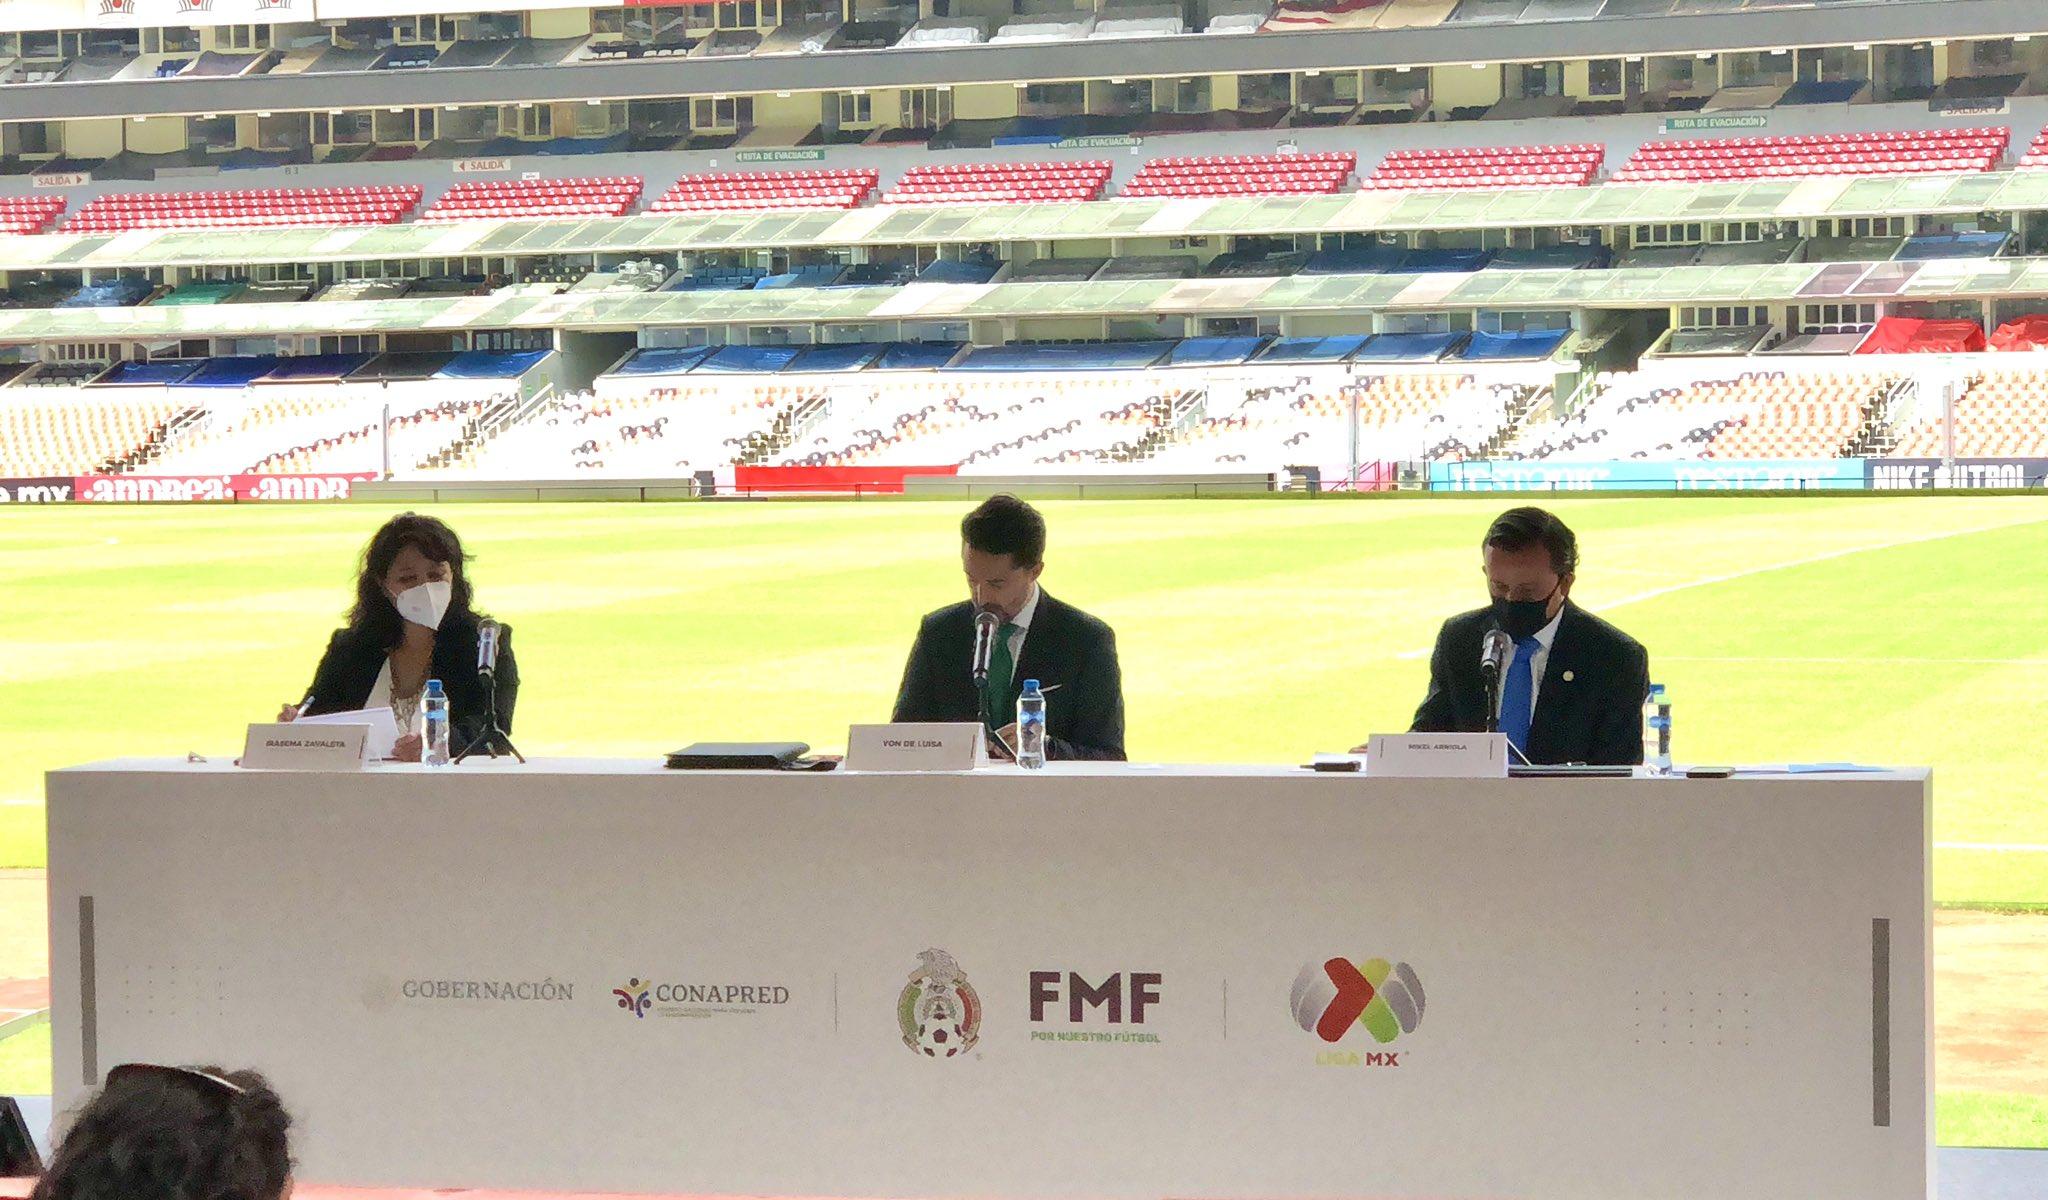 Libra Selección Mexicana veto de la FIFA por grito homofóbico; FMF solo debe pagar 2.2 mdp